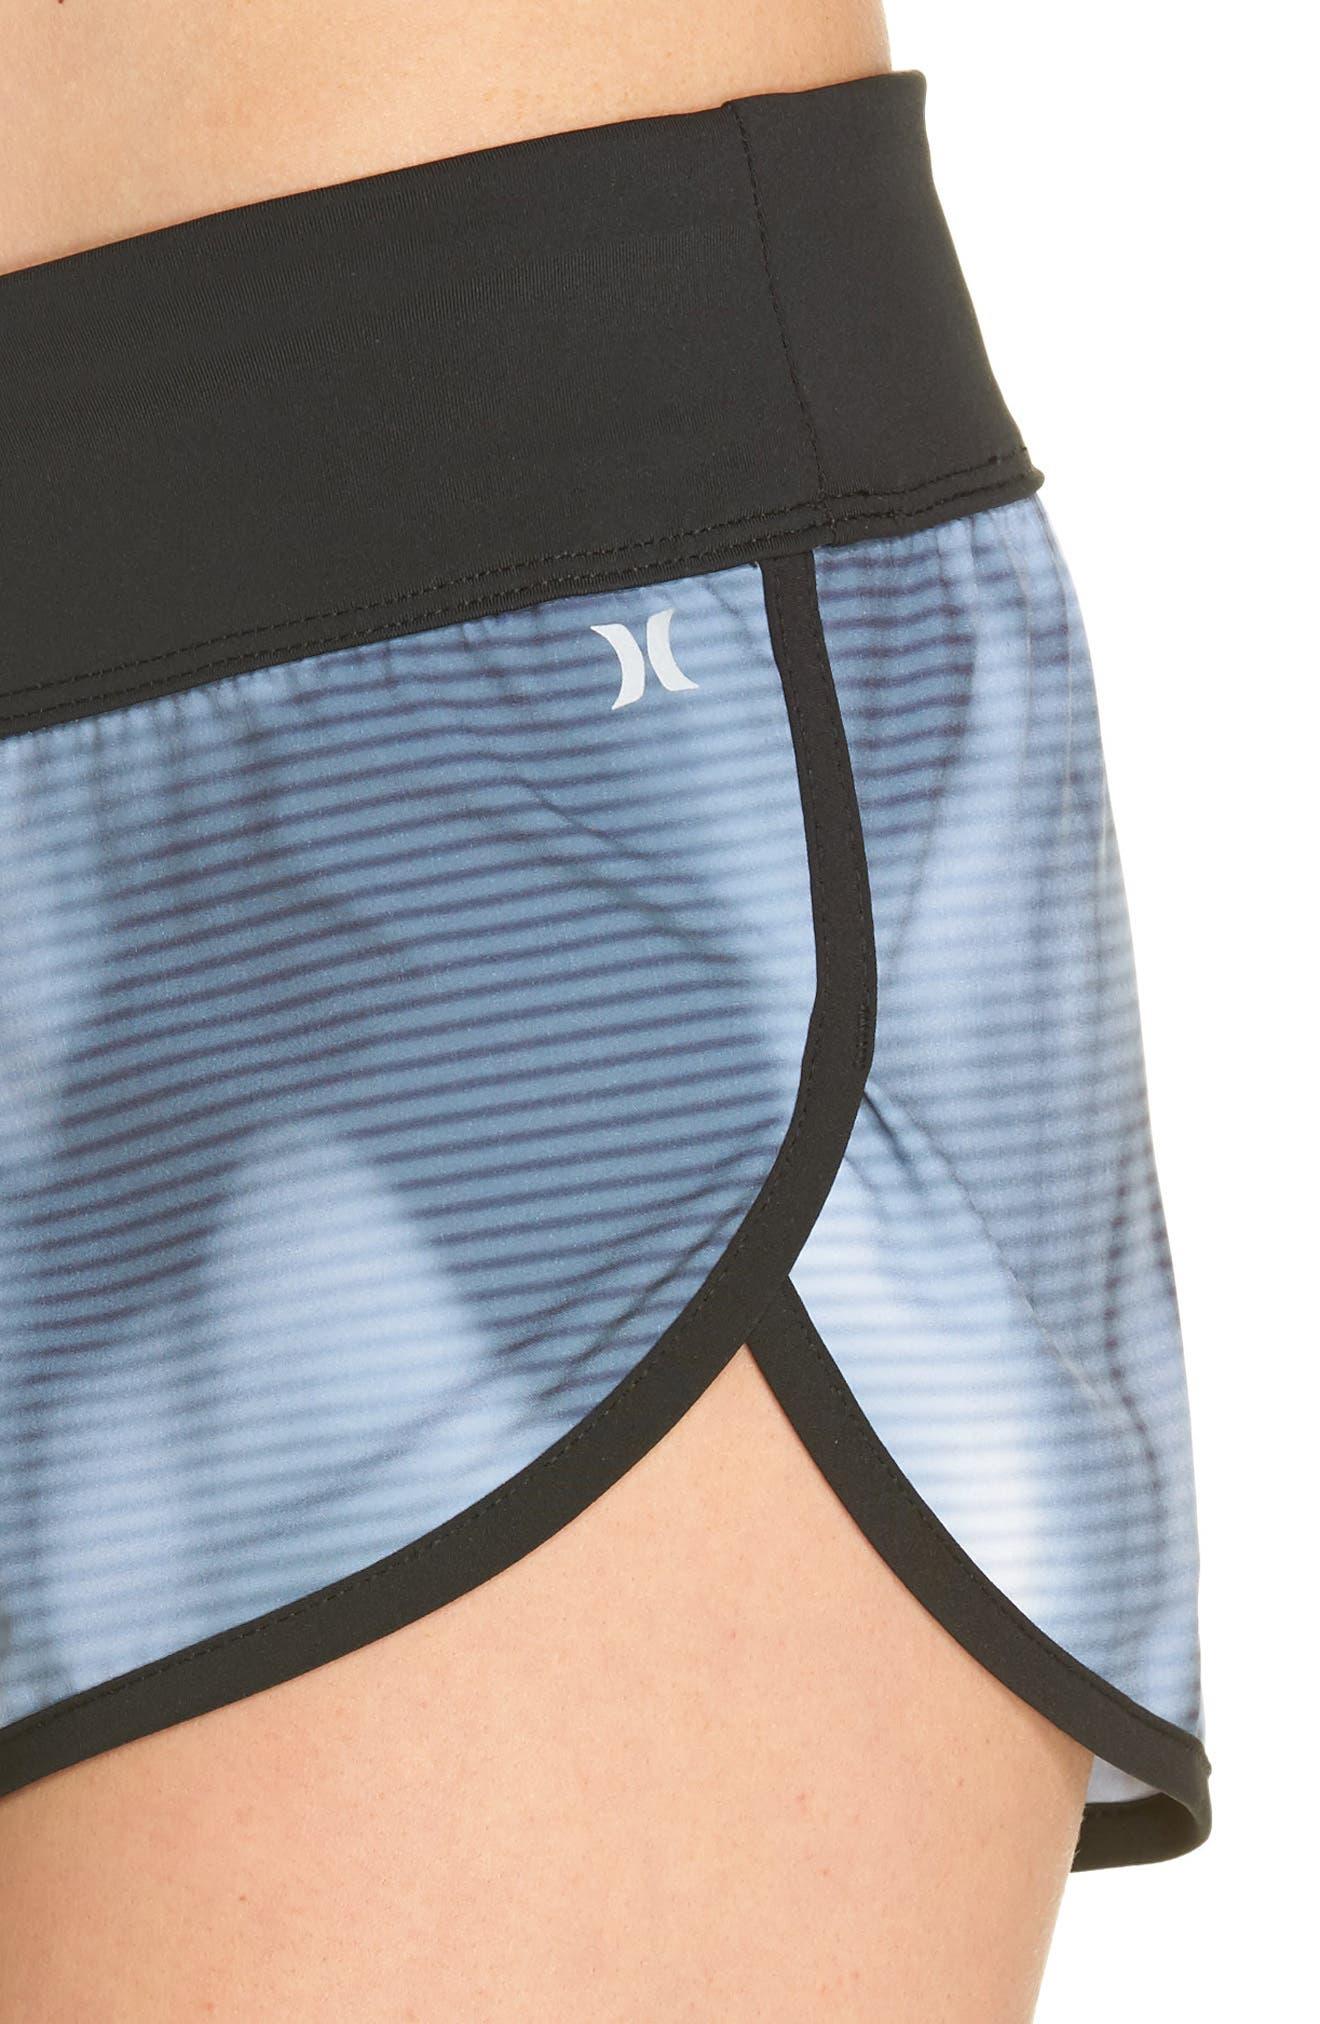 Phantom Waves Beachrider Shorts,                             Alternate thumbnail 4, color,                             Squadron Blue